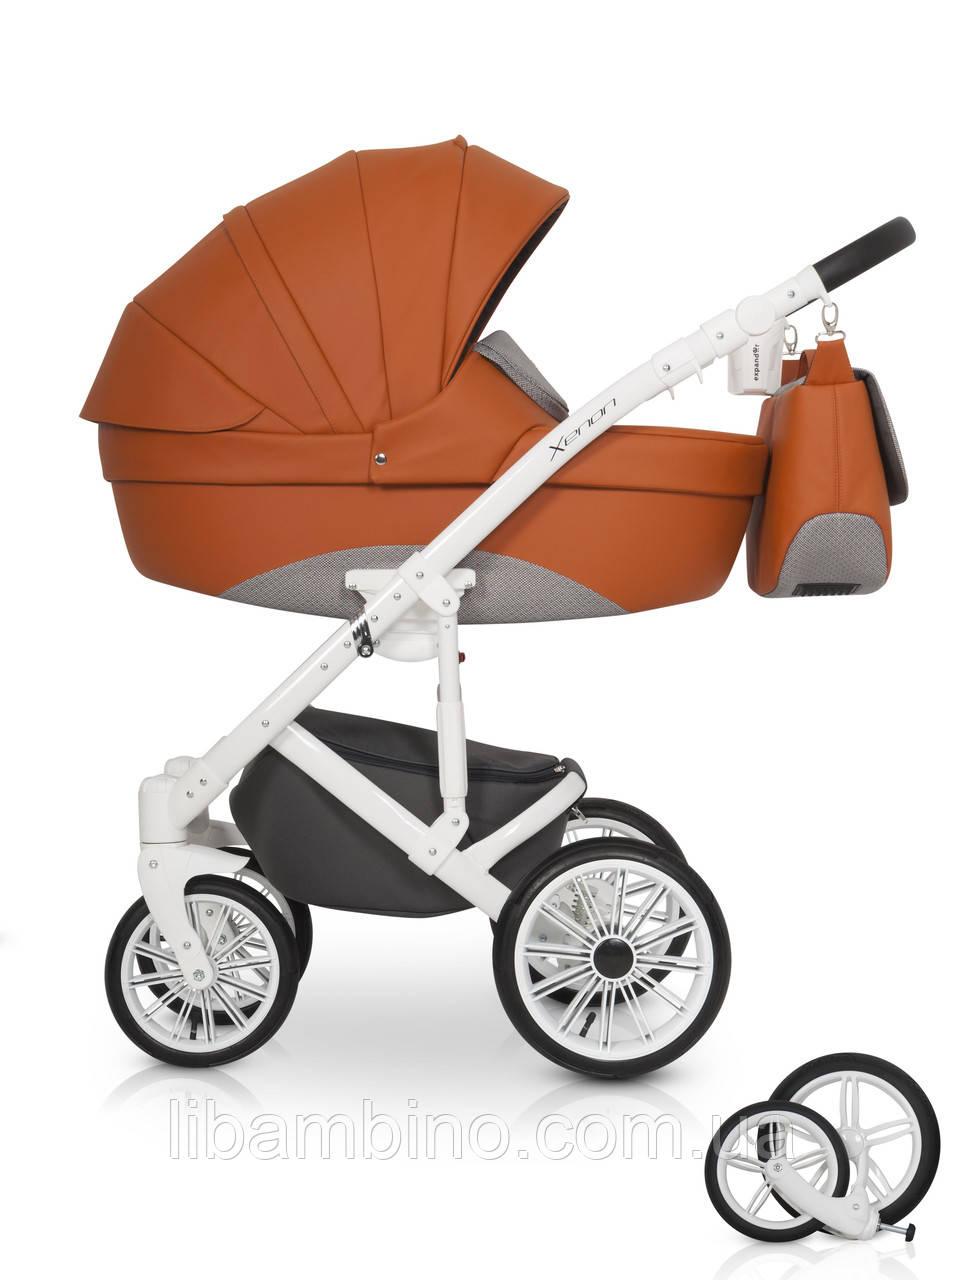 Дитяча універсальна коляска 2 в 1 Expander Xenon 02 Copper, фото 1